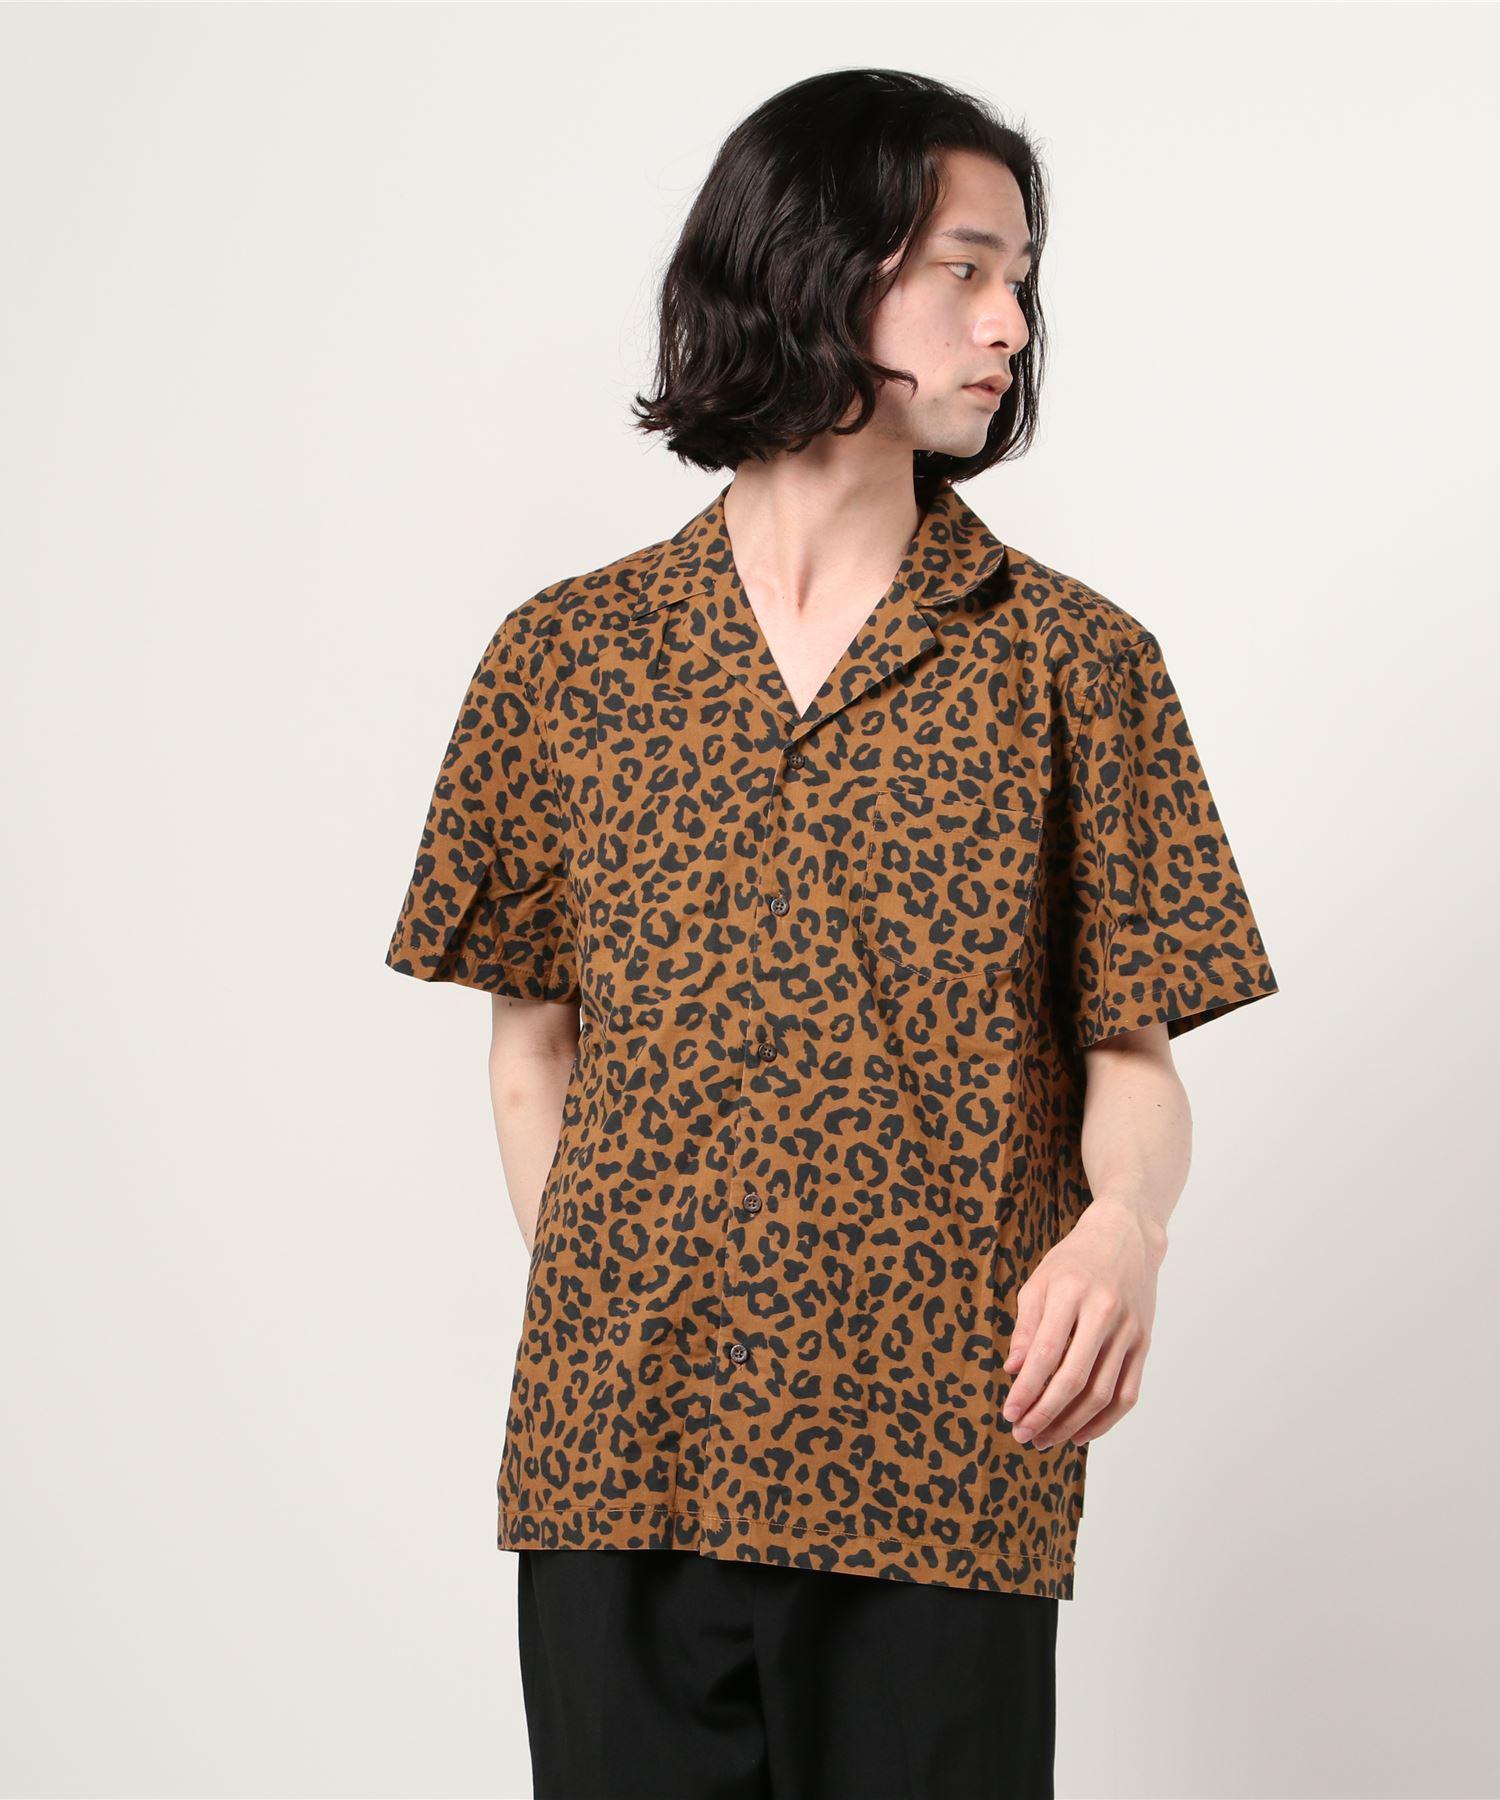 【 BANKS JOURNAL / バンクスジャーナル 】WILDER レオパード柄 半袖オープンカラーシャツ JJA